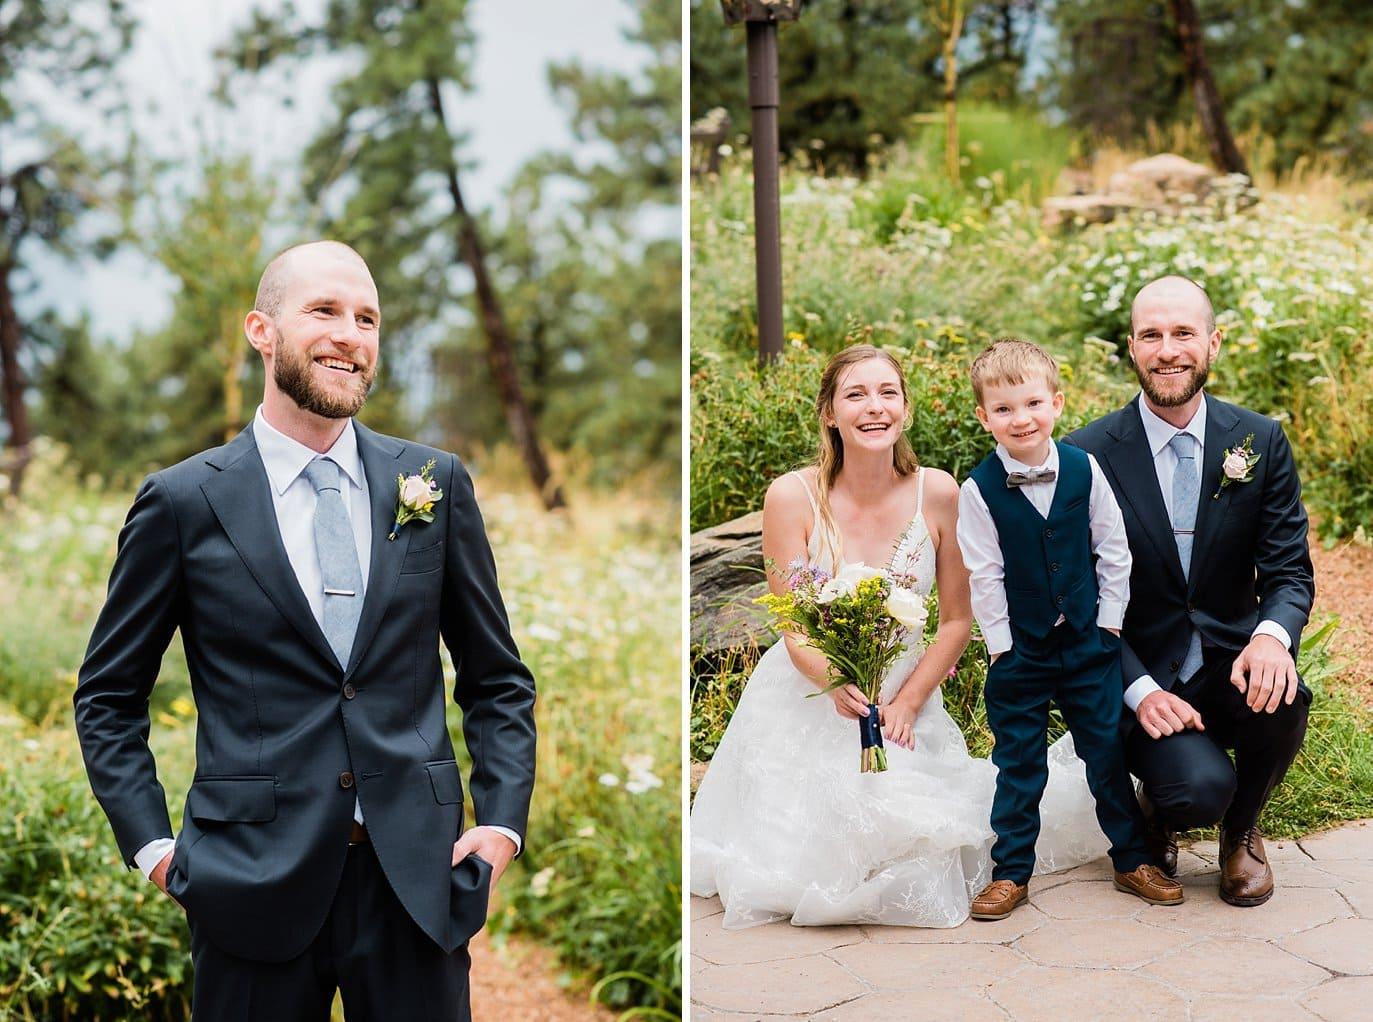 groom in navy suite with periwinkle tie and ring bearer colorado wedding